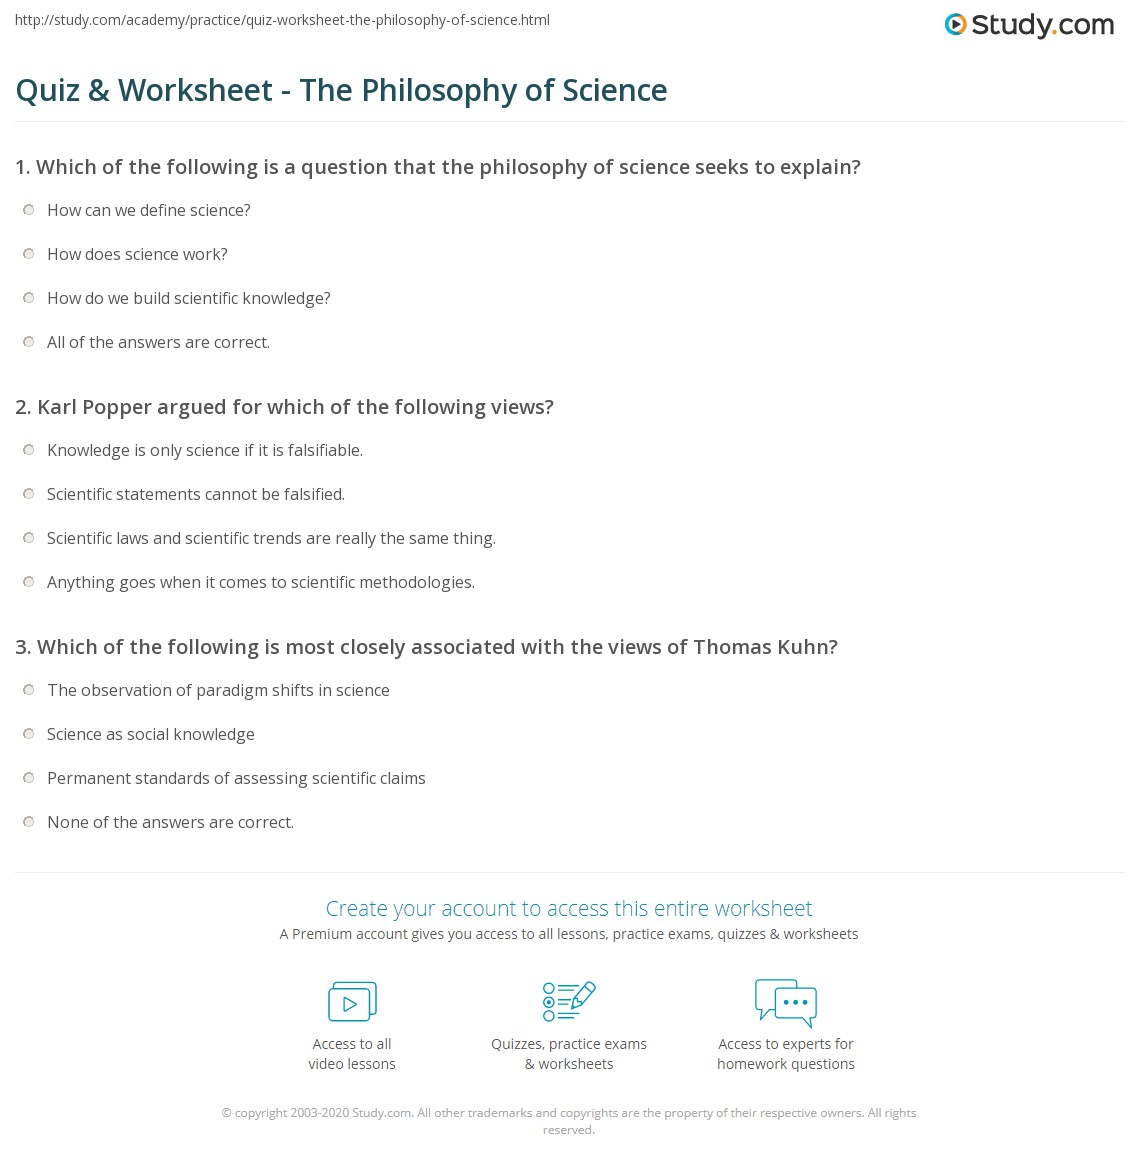 Quiz & Worksheet - The Philosophy of Science | Study com